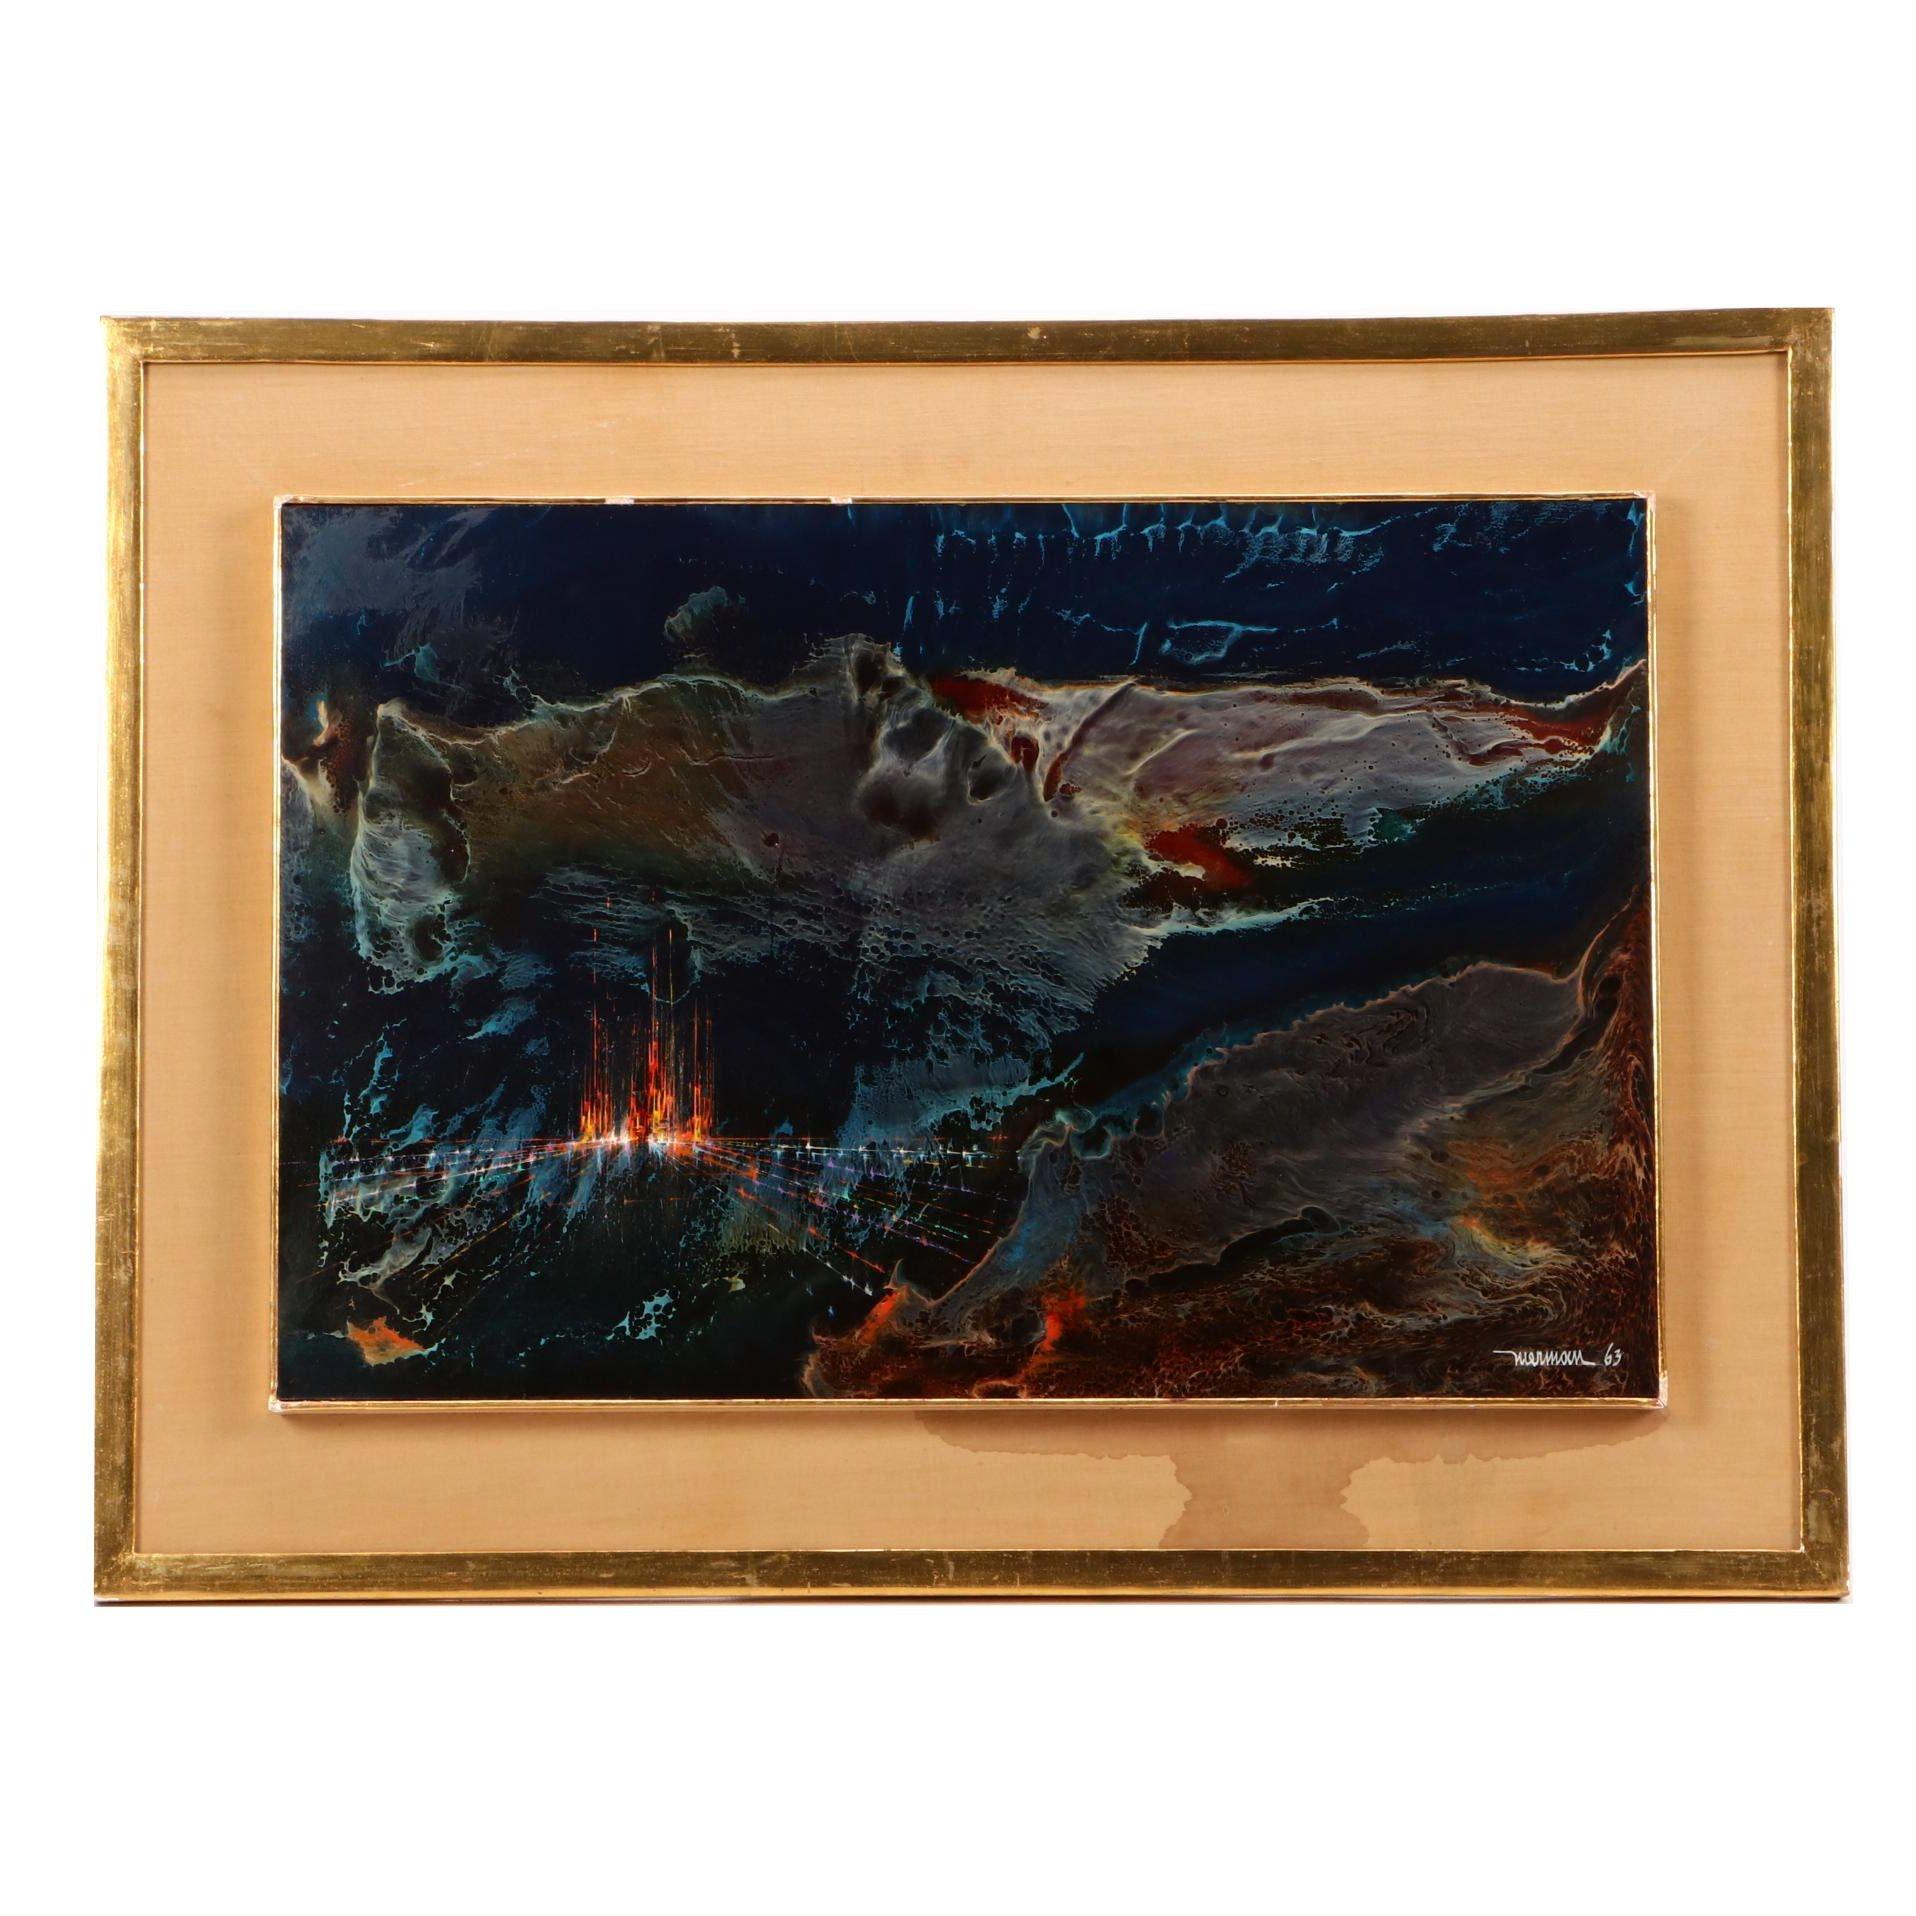 Leonardo Nierman 1963 Abstract Expressionist Oil Painting